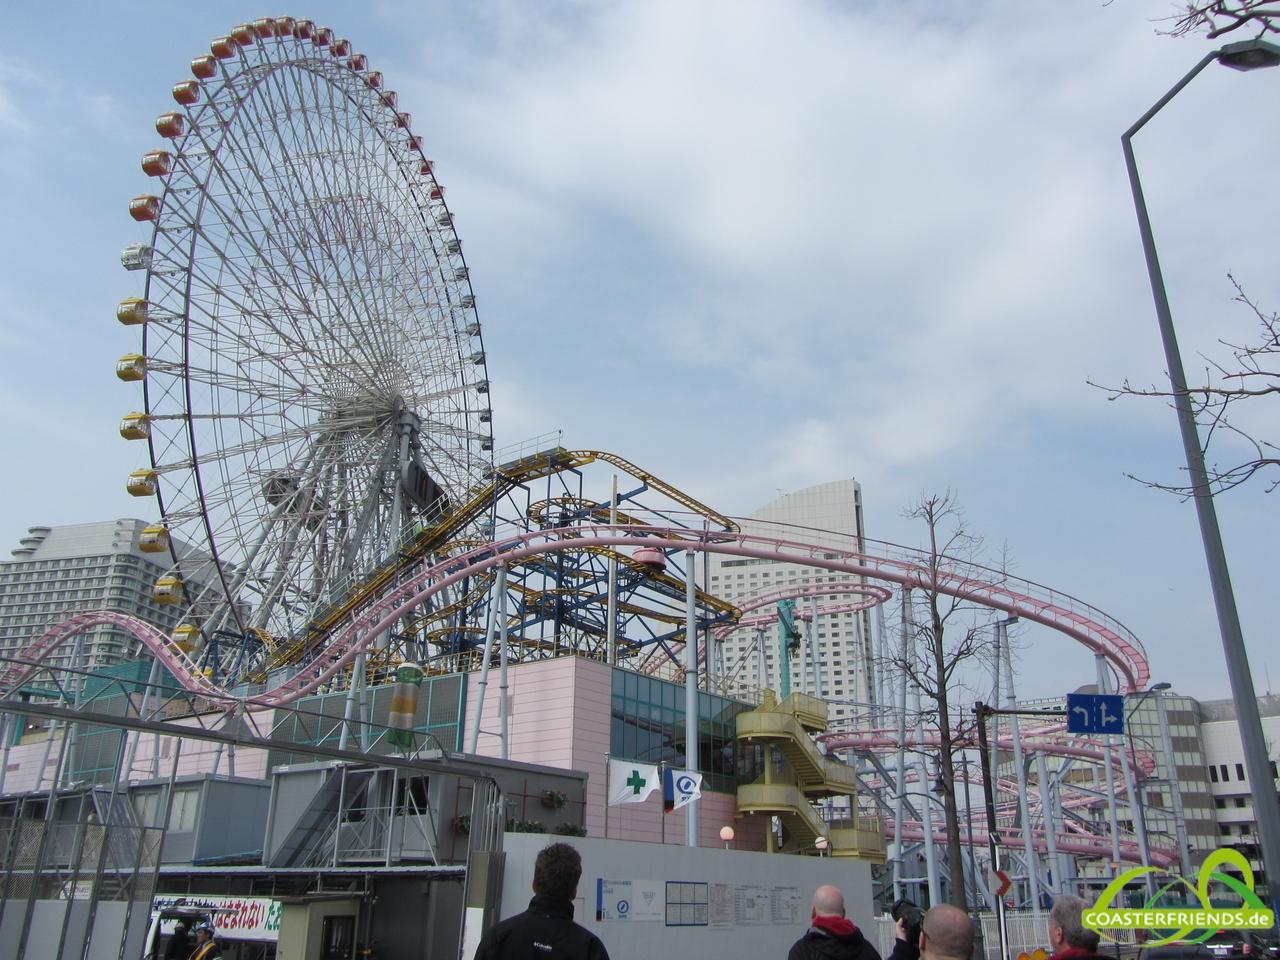 Asien - https://coasterfriends.de/joomla//images/pcp_parkdetails/asien/o3202_yokohama_cosmoworld/content1.jpg